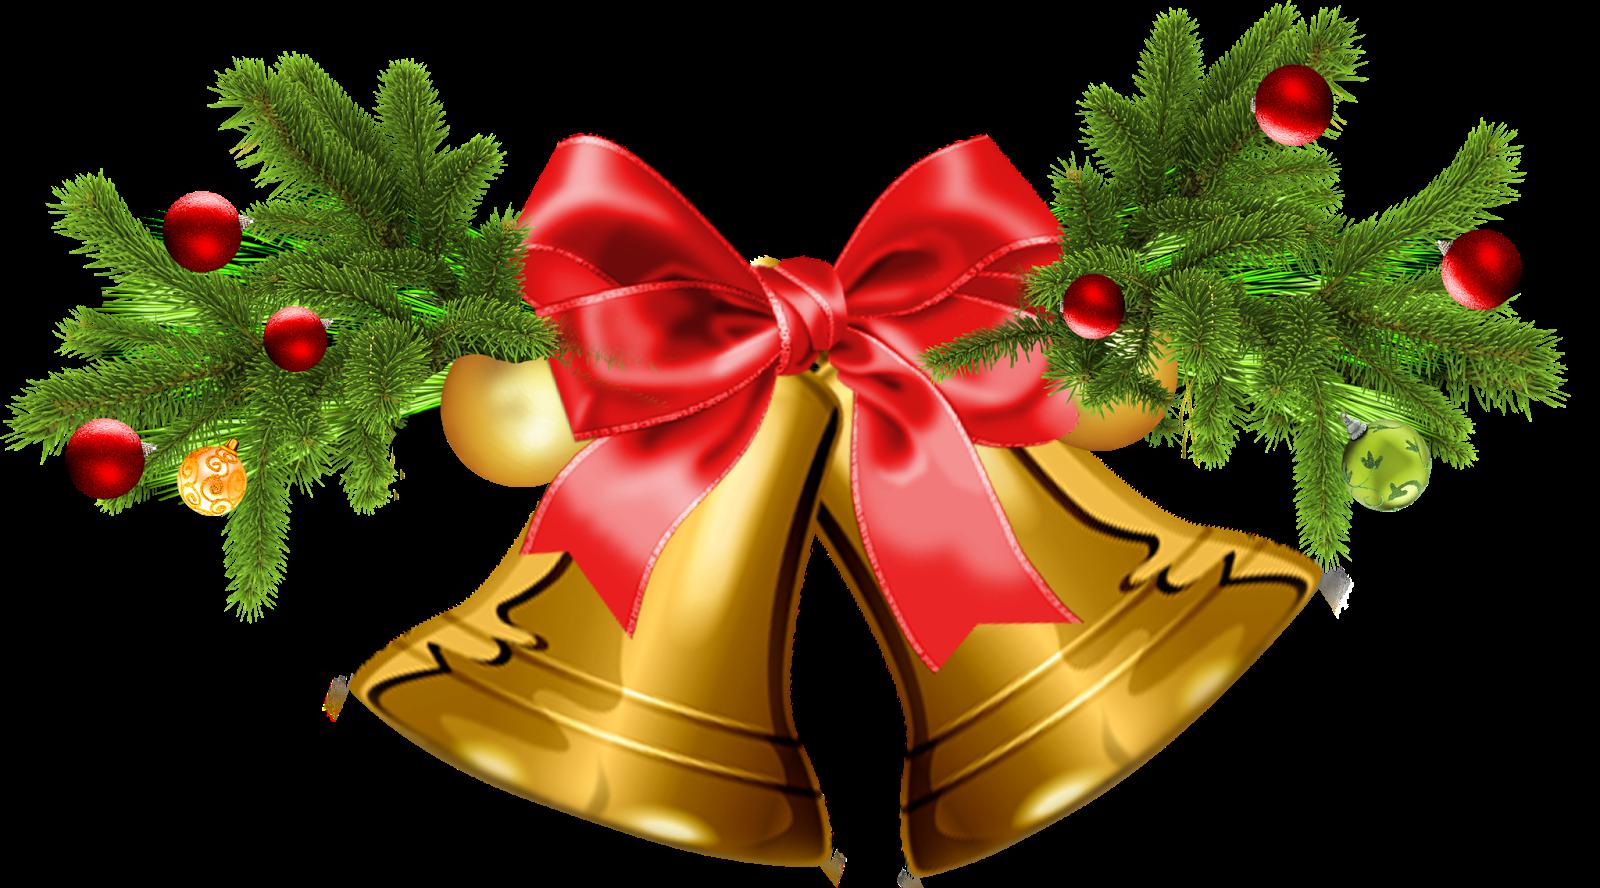 Adornos de navidad con fondo transparente im genes de - Adornos navidenos para arbol de navidad ...